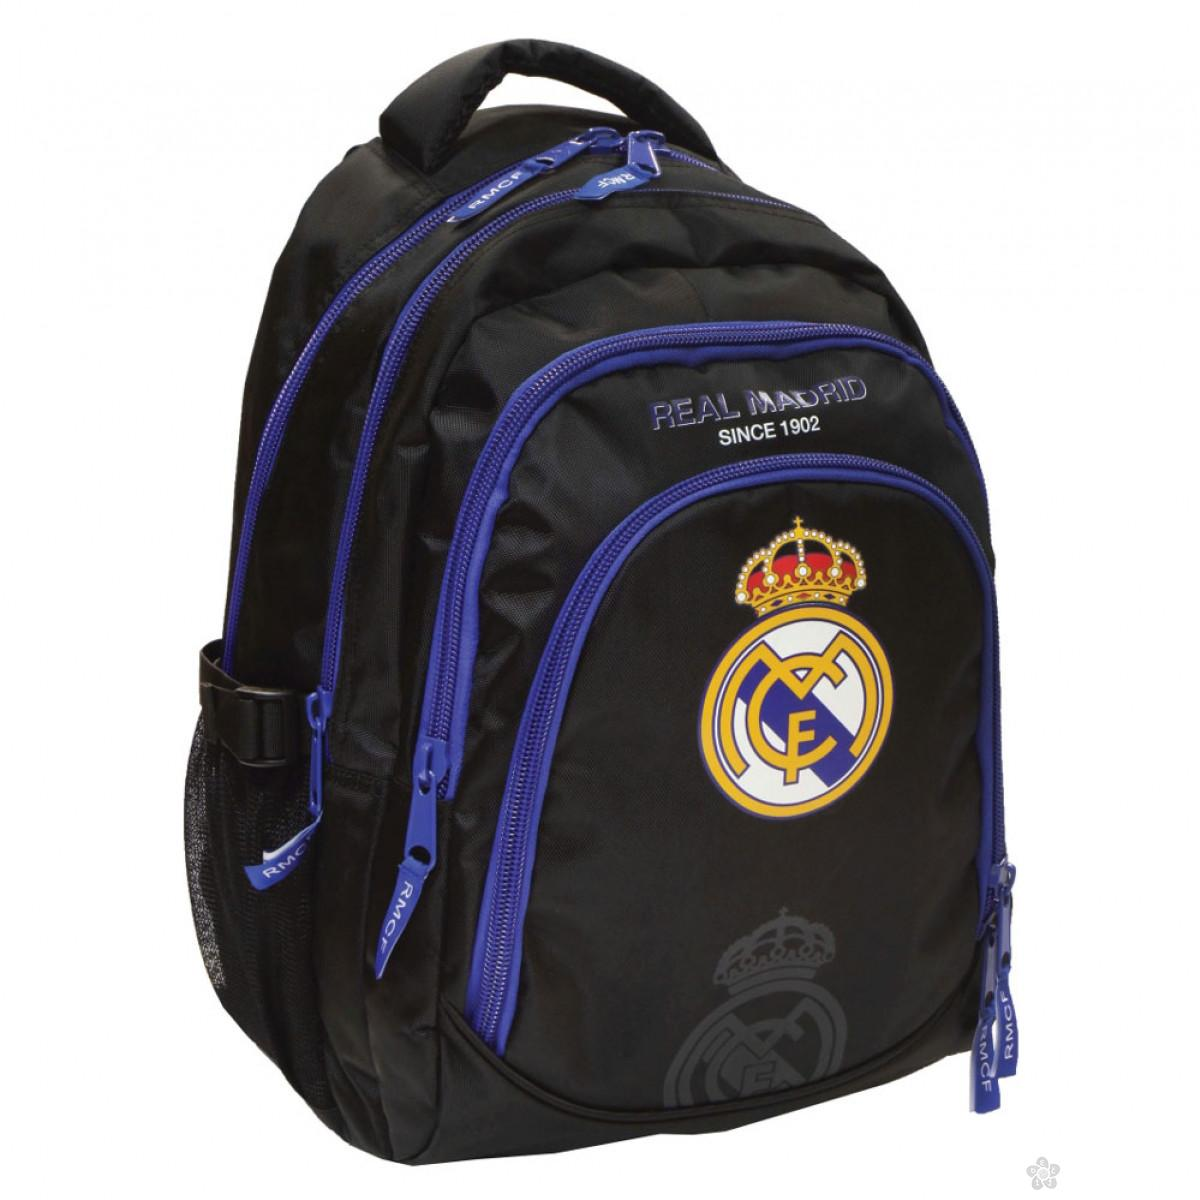 Ovalni ranac Real Madrid plavi 53228